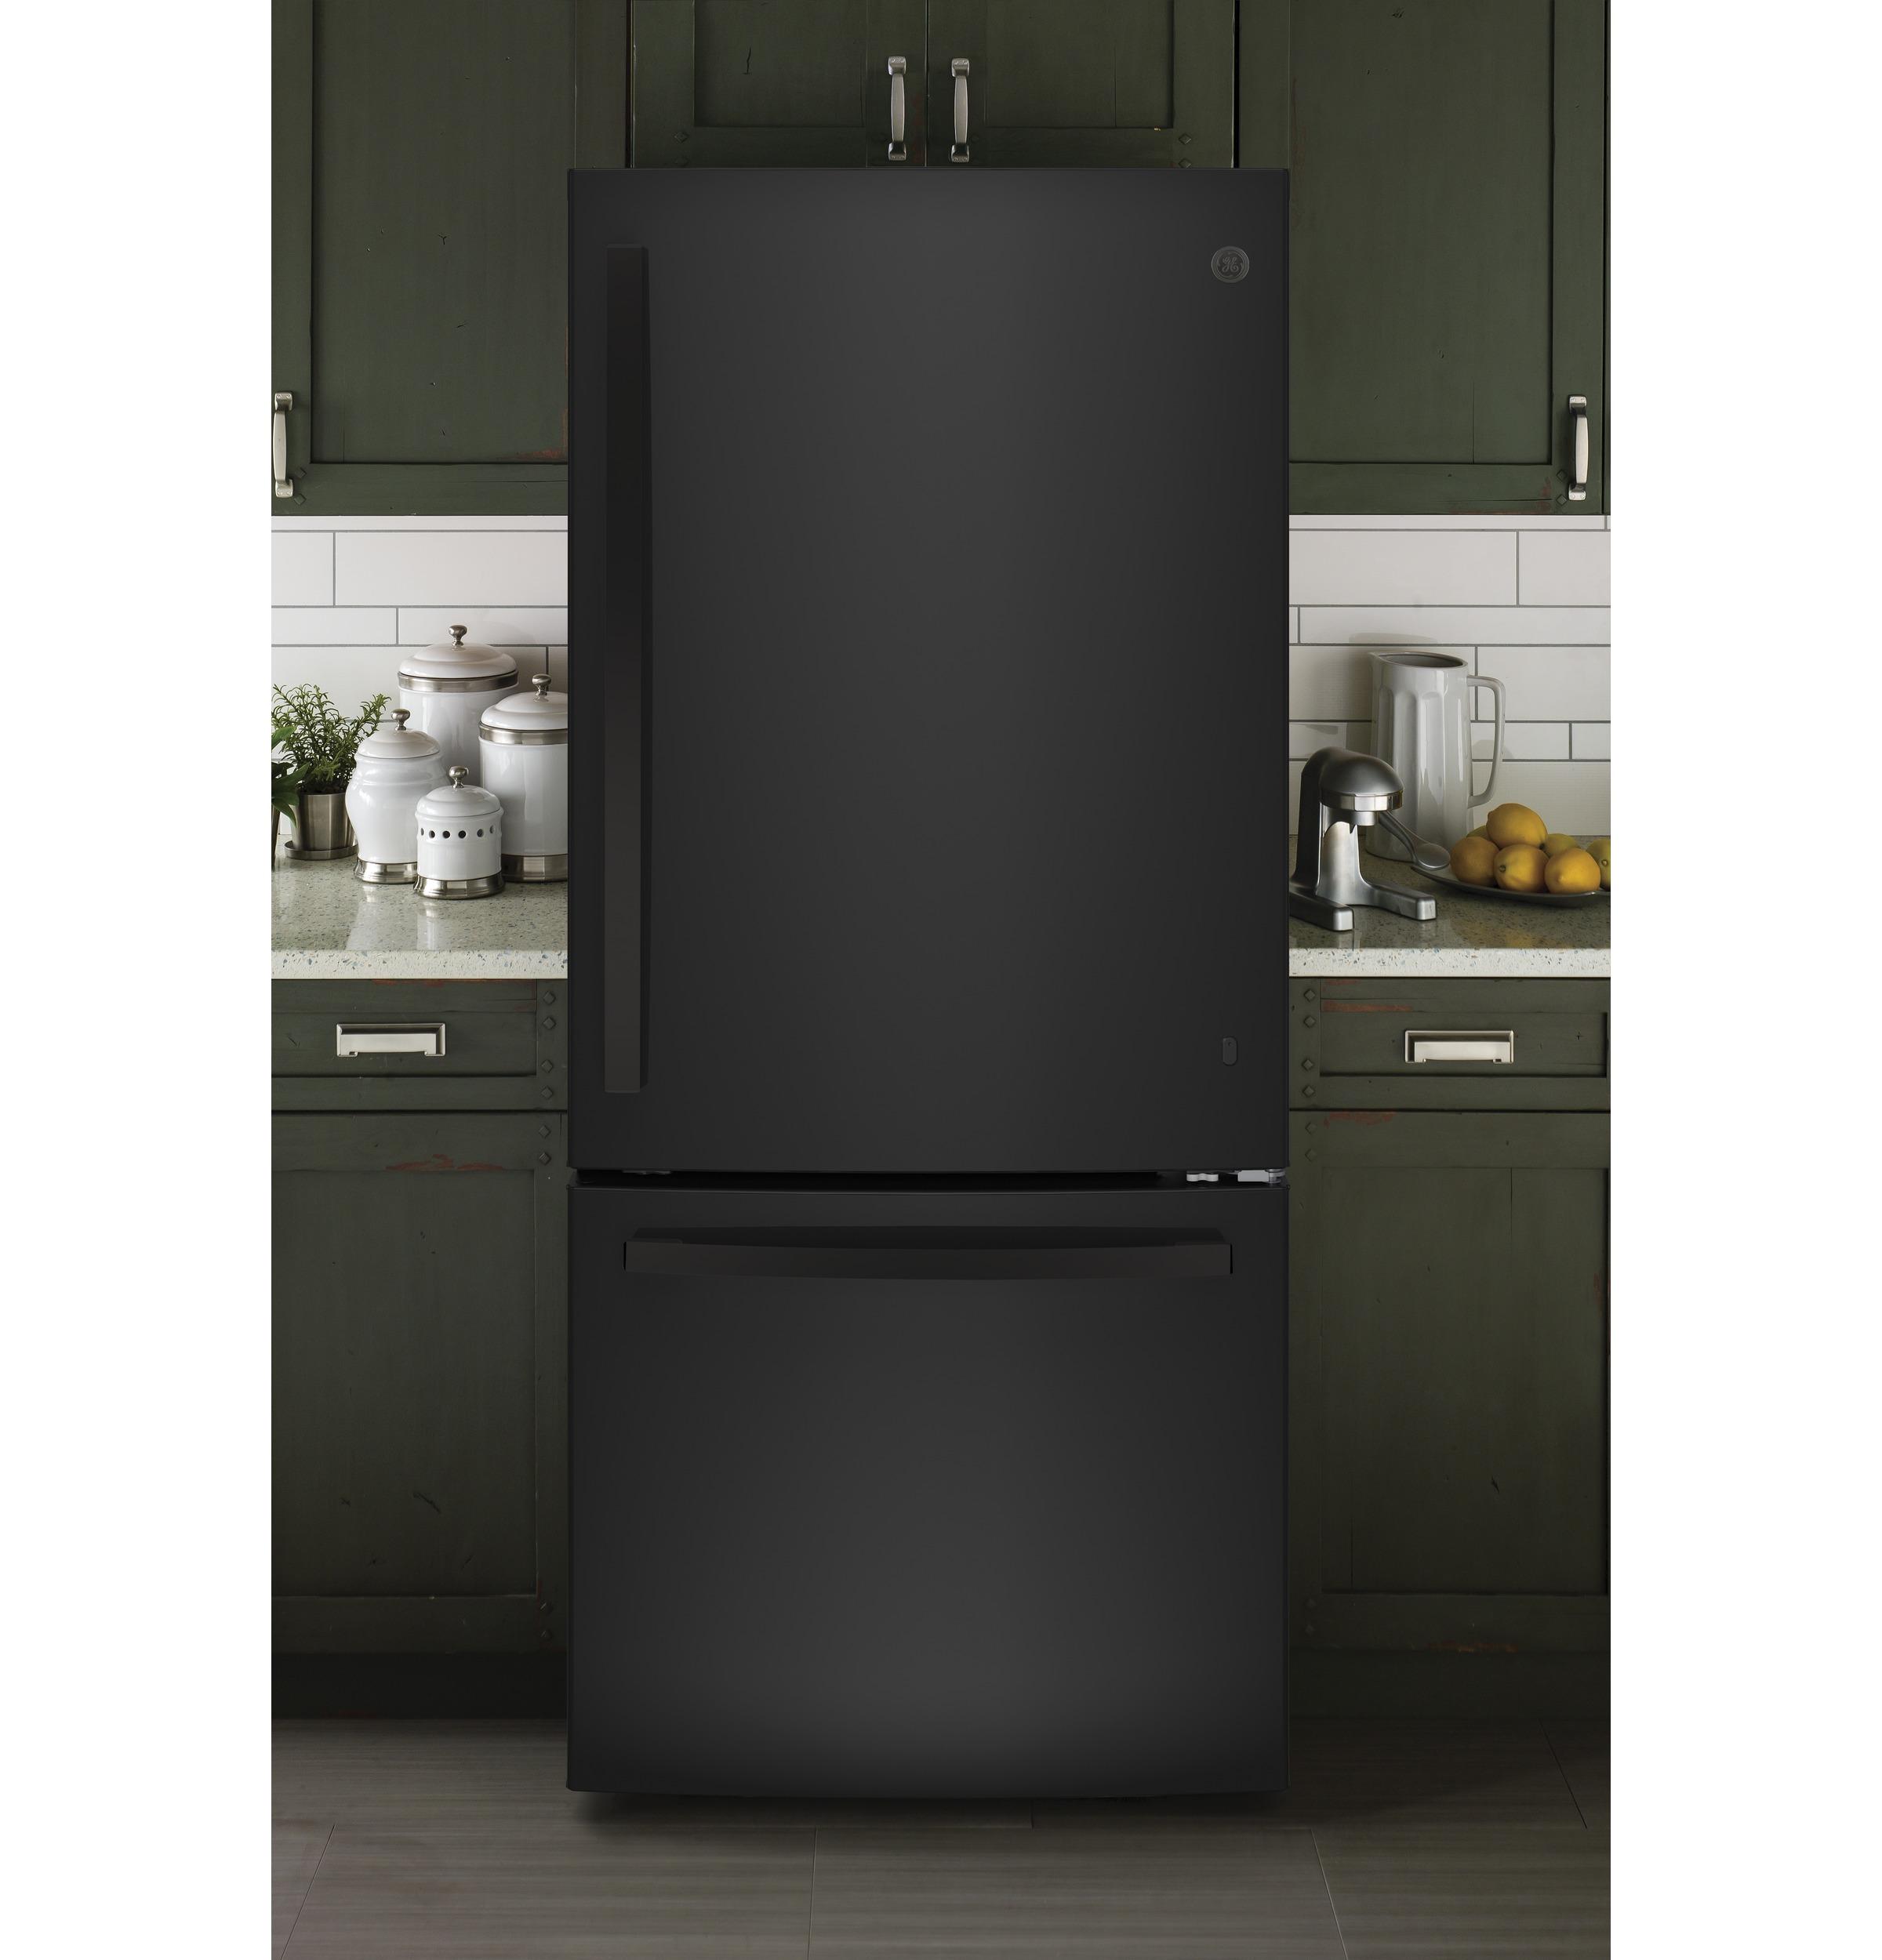 Model: GDE21EGKBB   GE GE® ENERGY STAR® 21.0 Cu. Ft. Bottom-Freezer Refrigerator